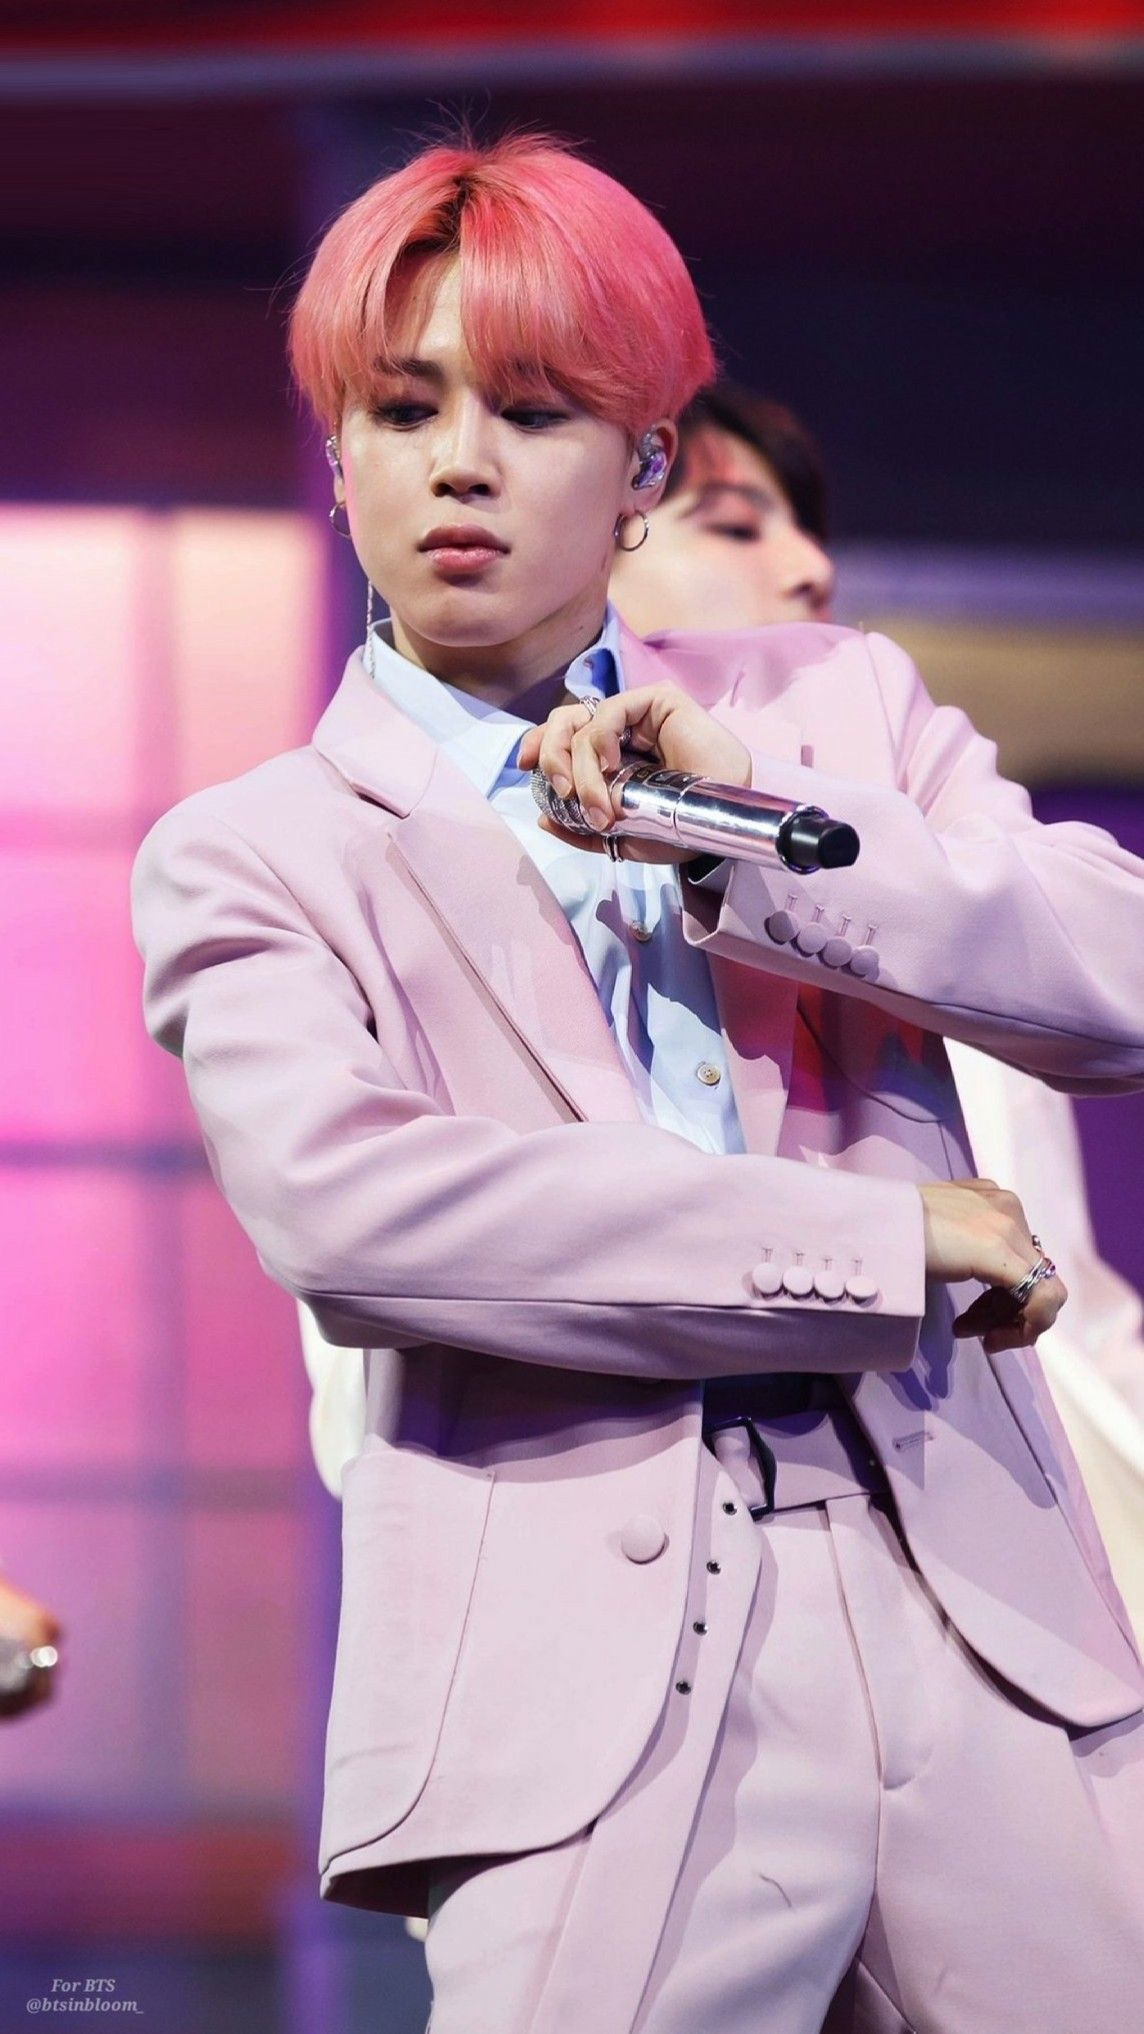 Naver X Dispatch Hd Jimin Boy With Luv Wallpapers Jimin Bts Jimin Park Jimin Bts